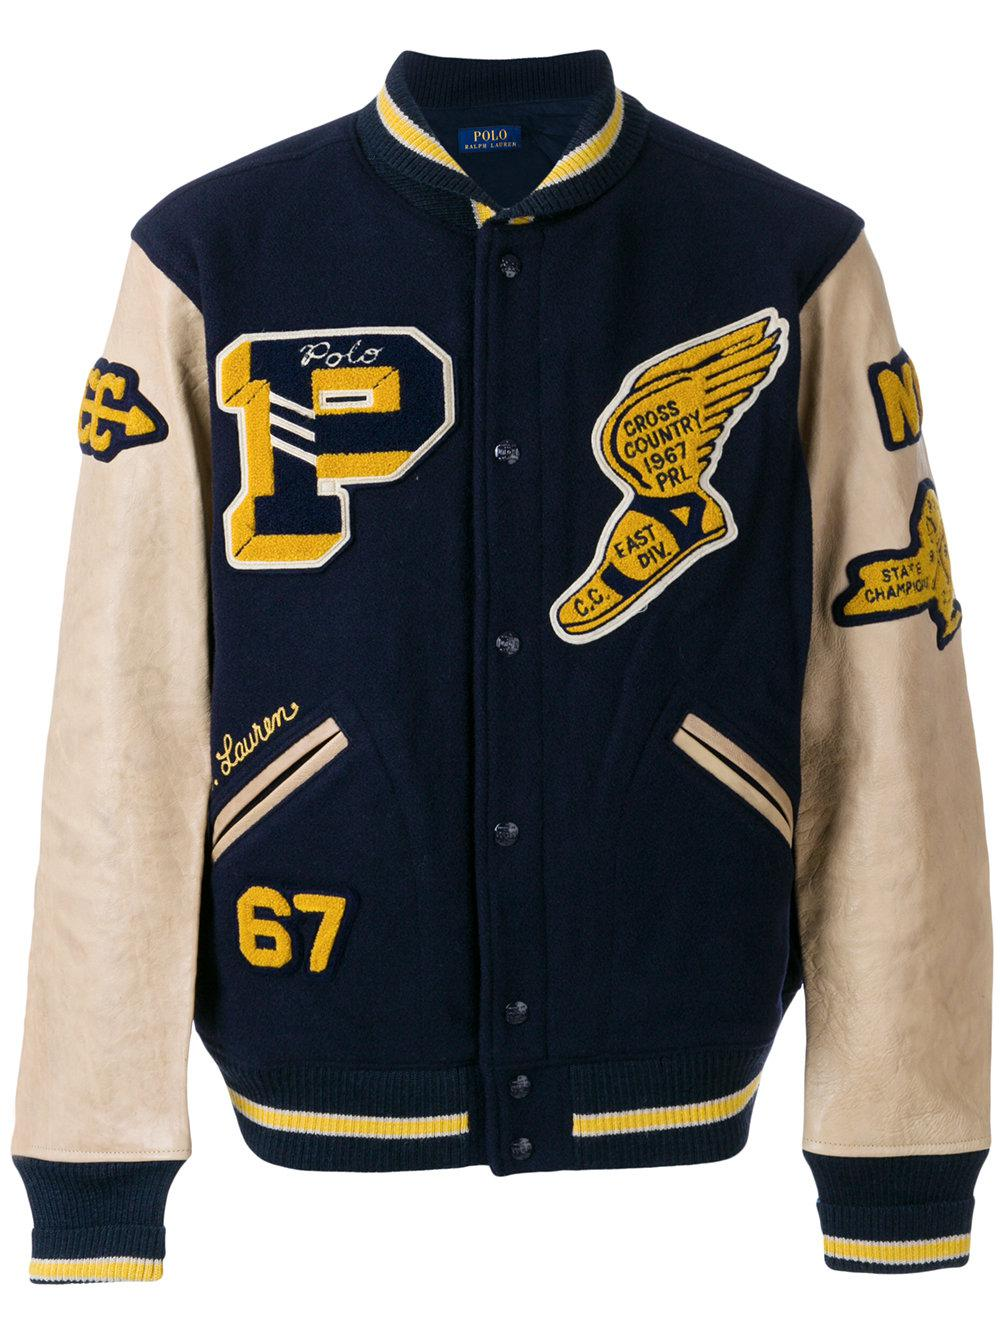 Polo Ralph Lauren Cotton Classic Varsity Bomber Jacket in